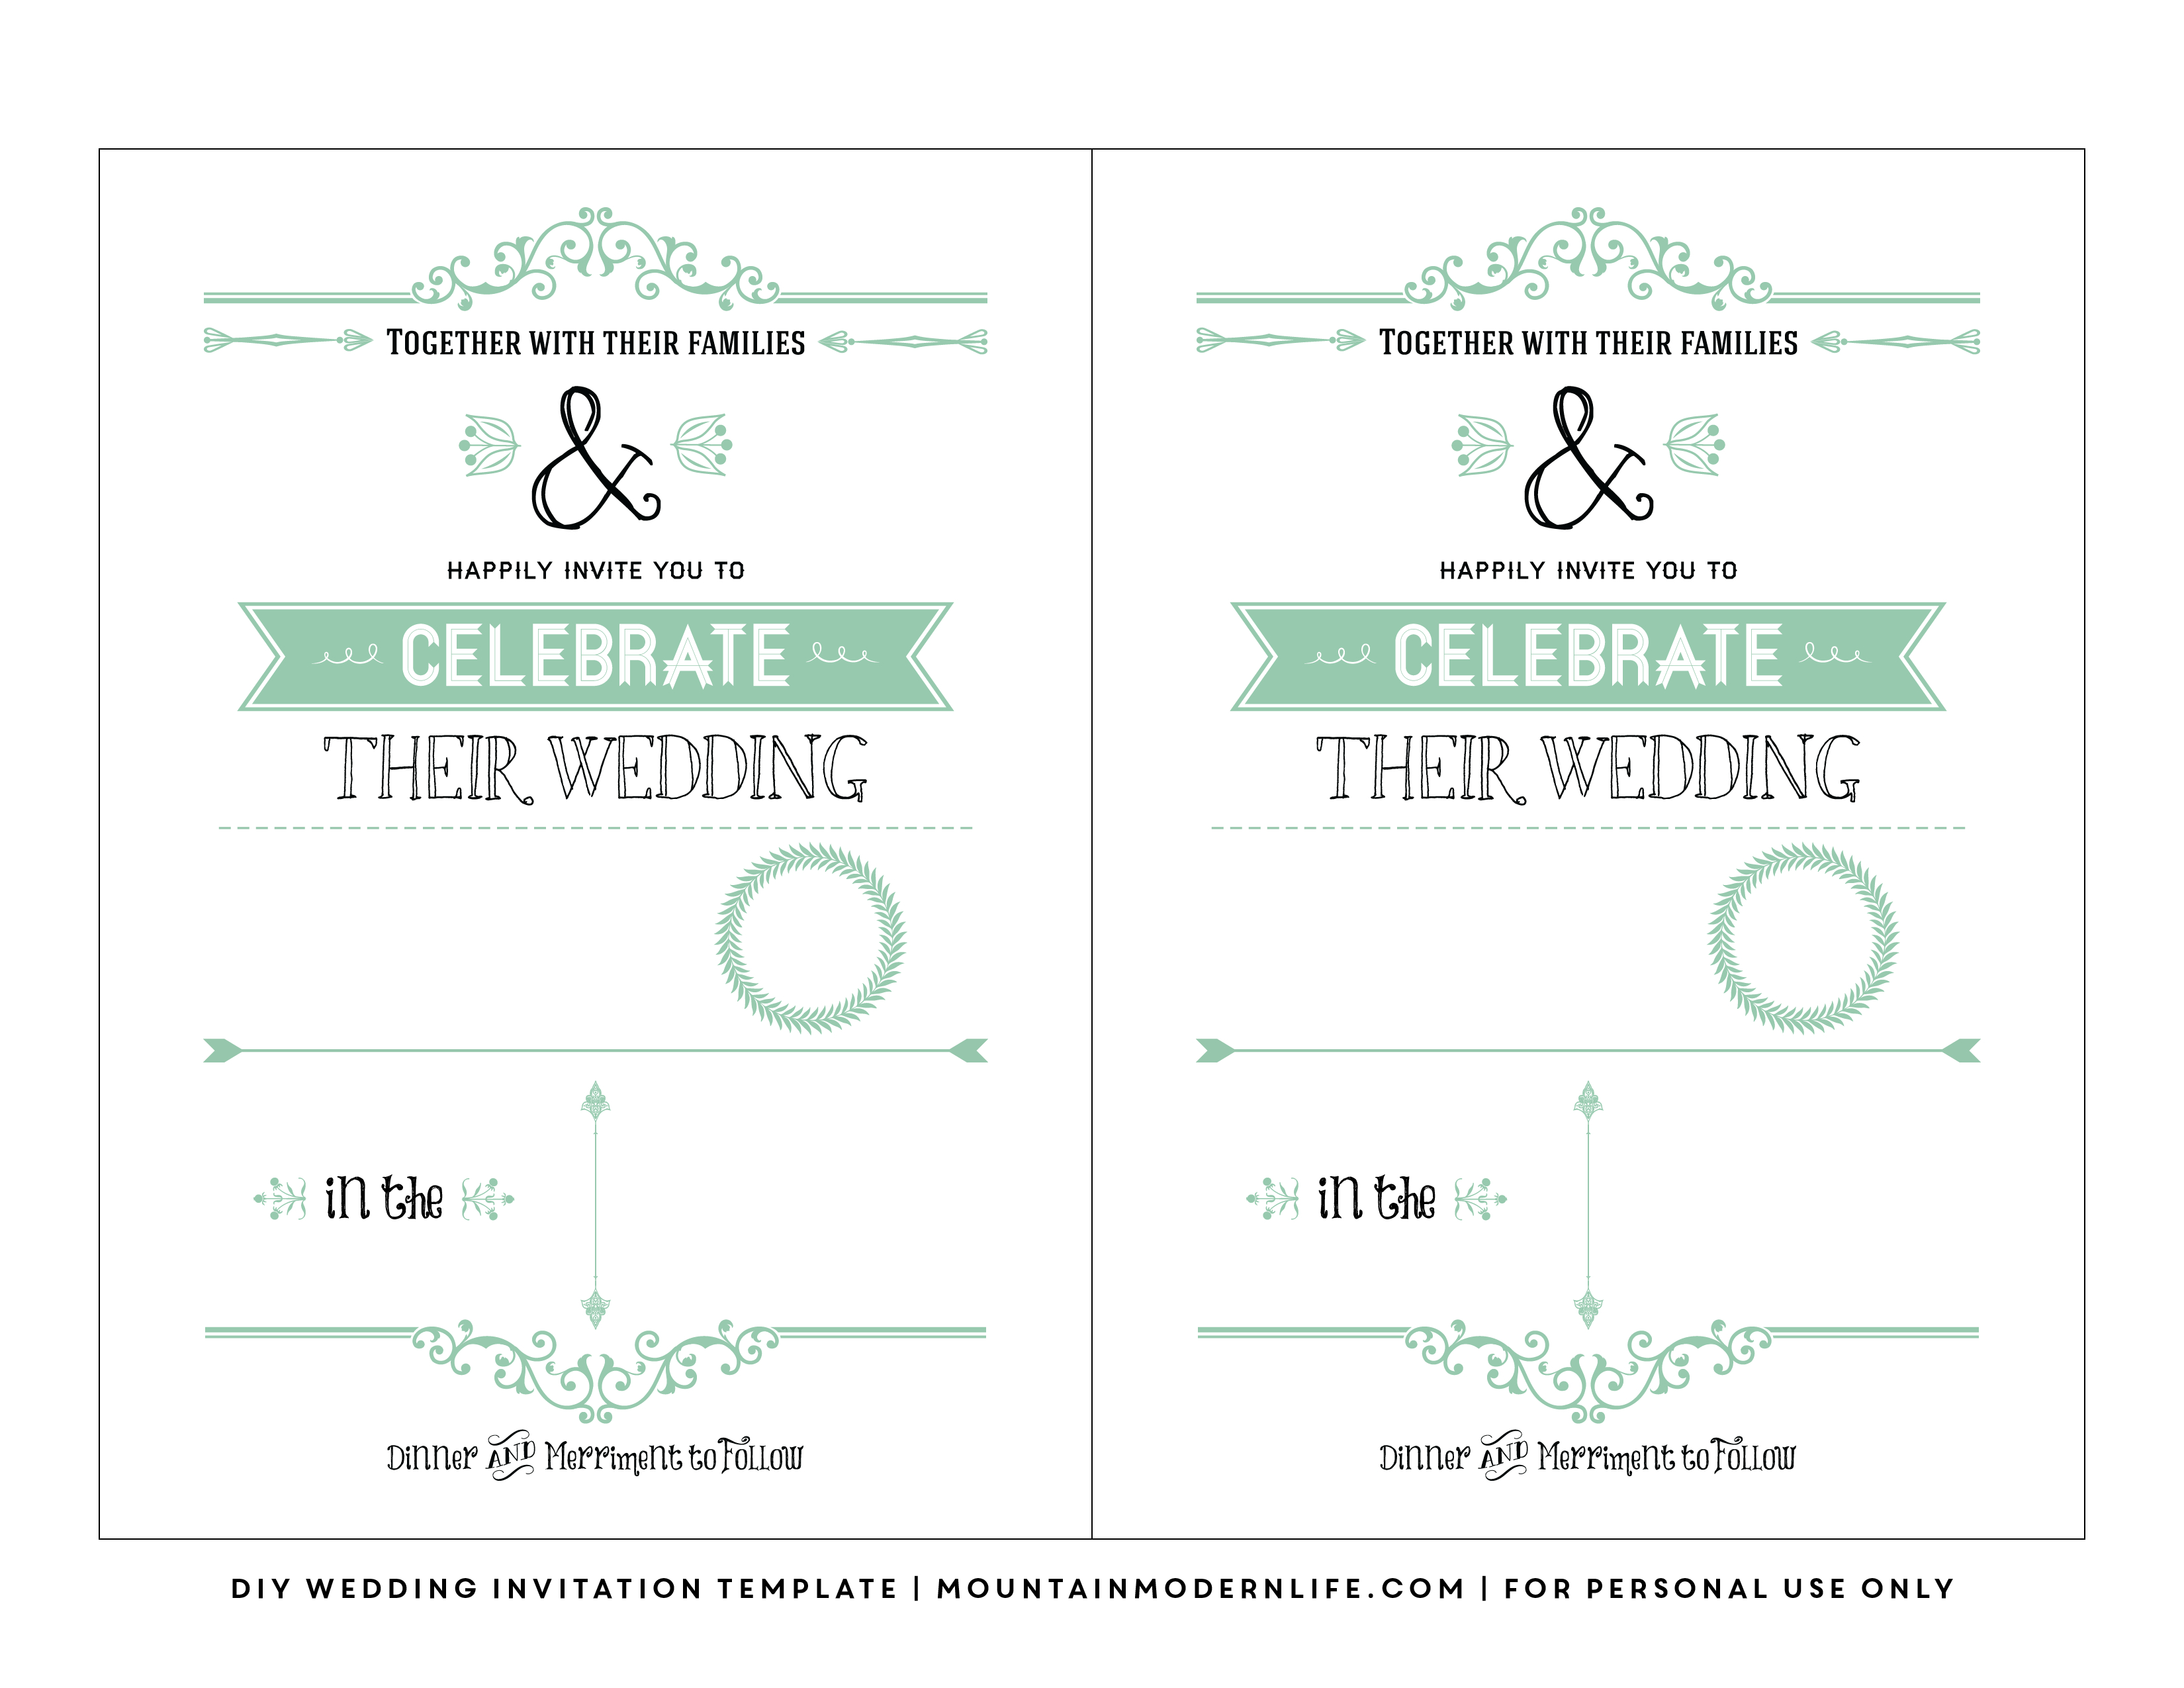 Free Wedding Invitation Template | Mountainmodernlife - Free Printable Wedding Invitations